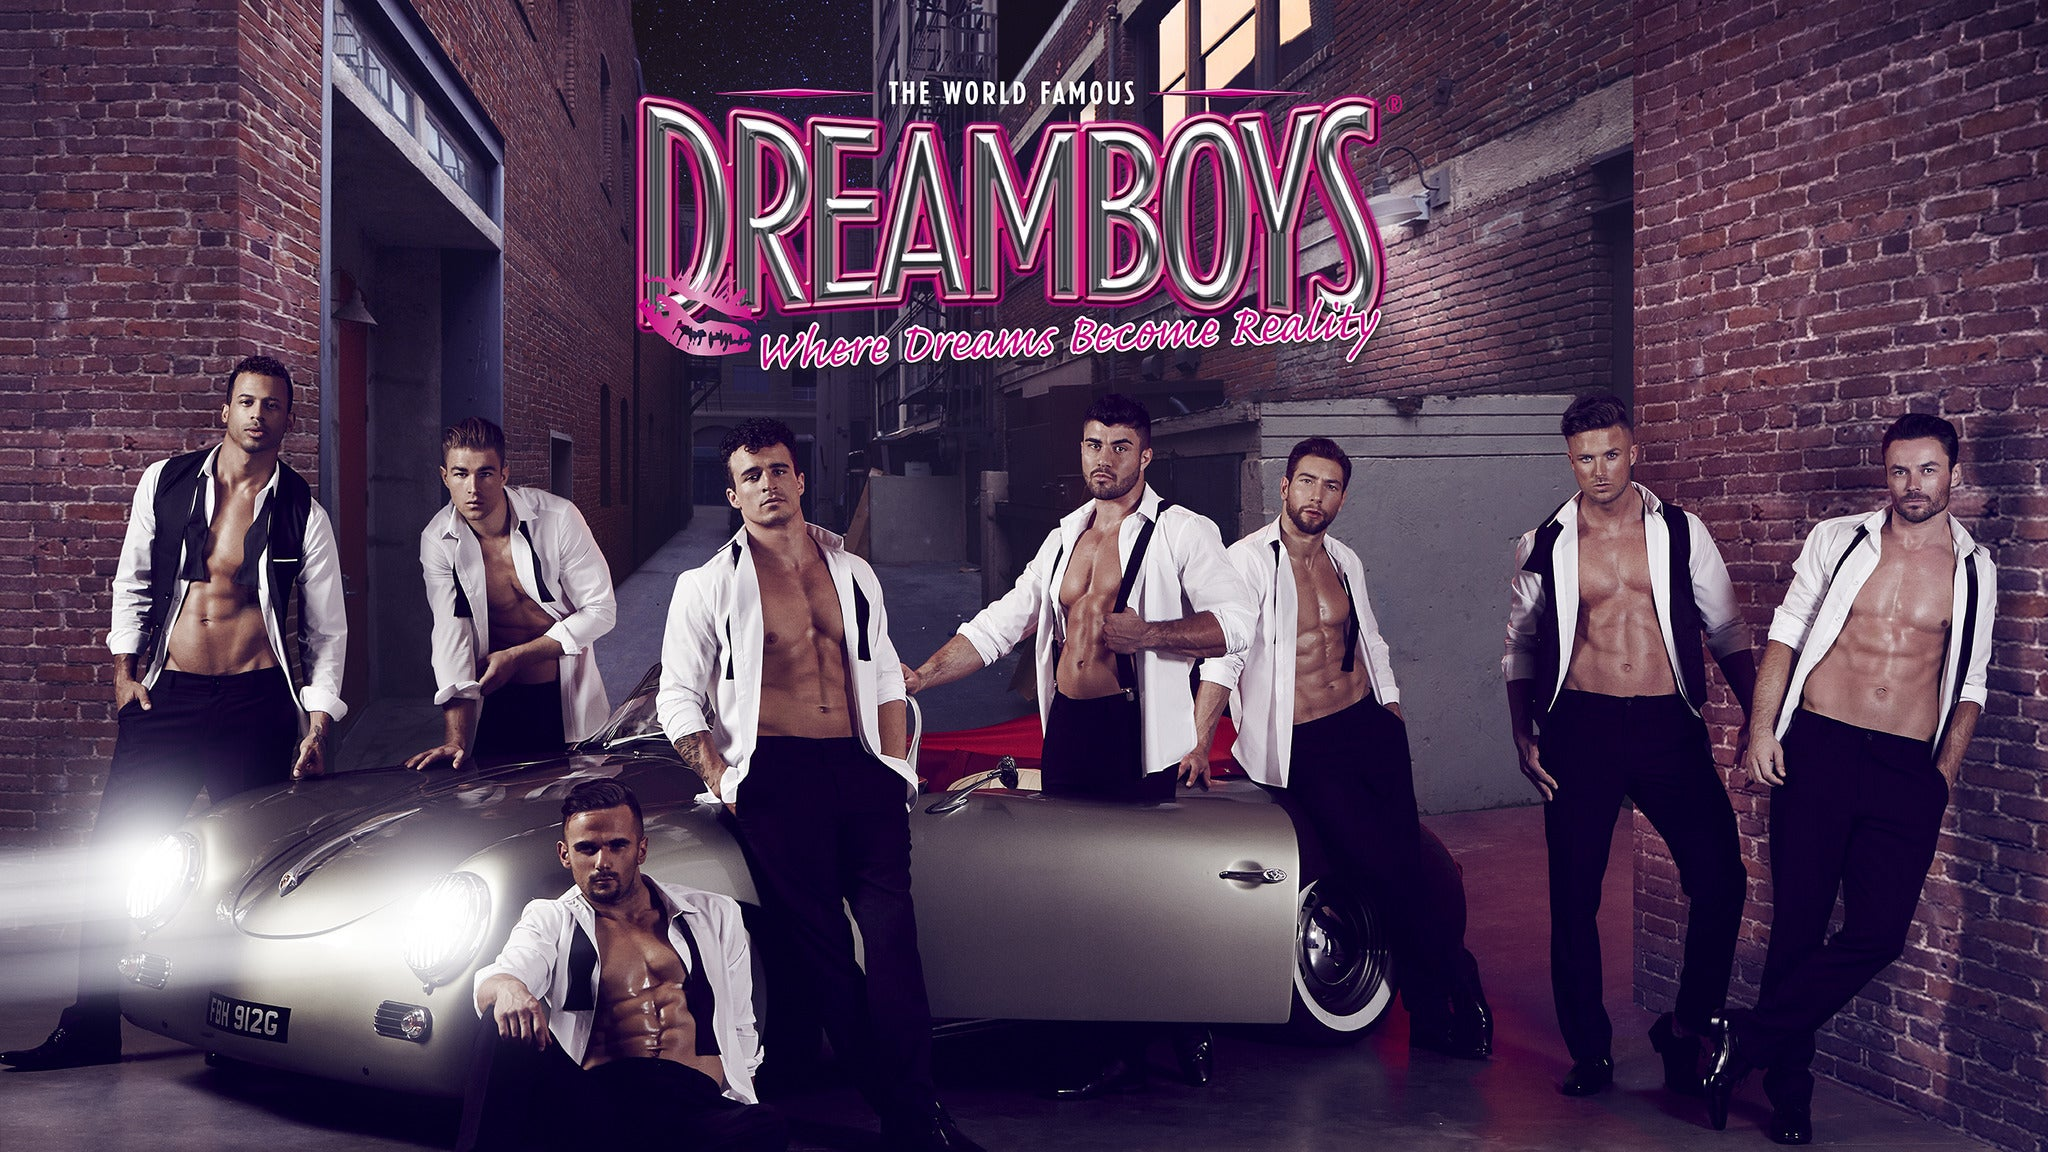 Dreamboys - Too Hard to Resist